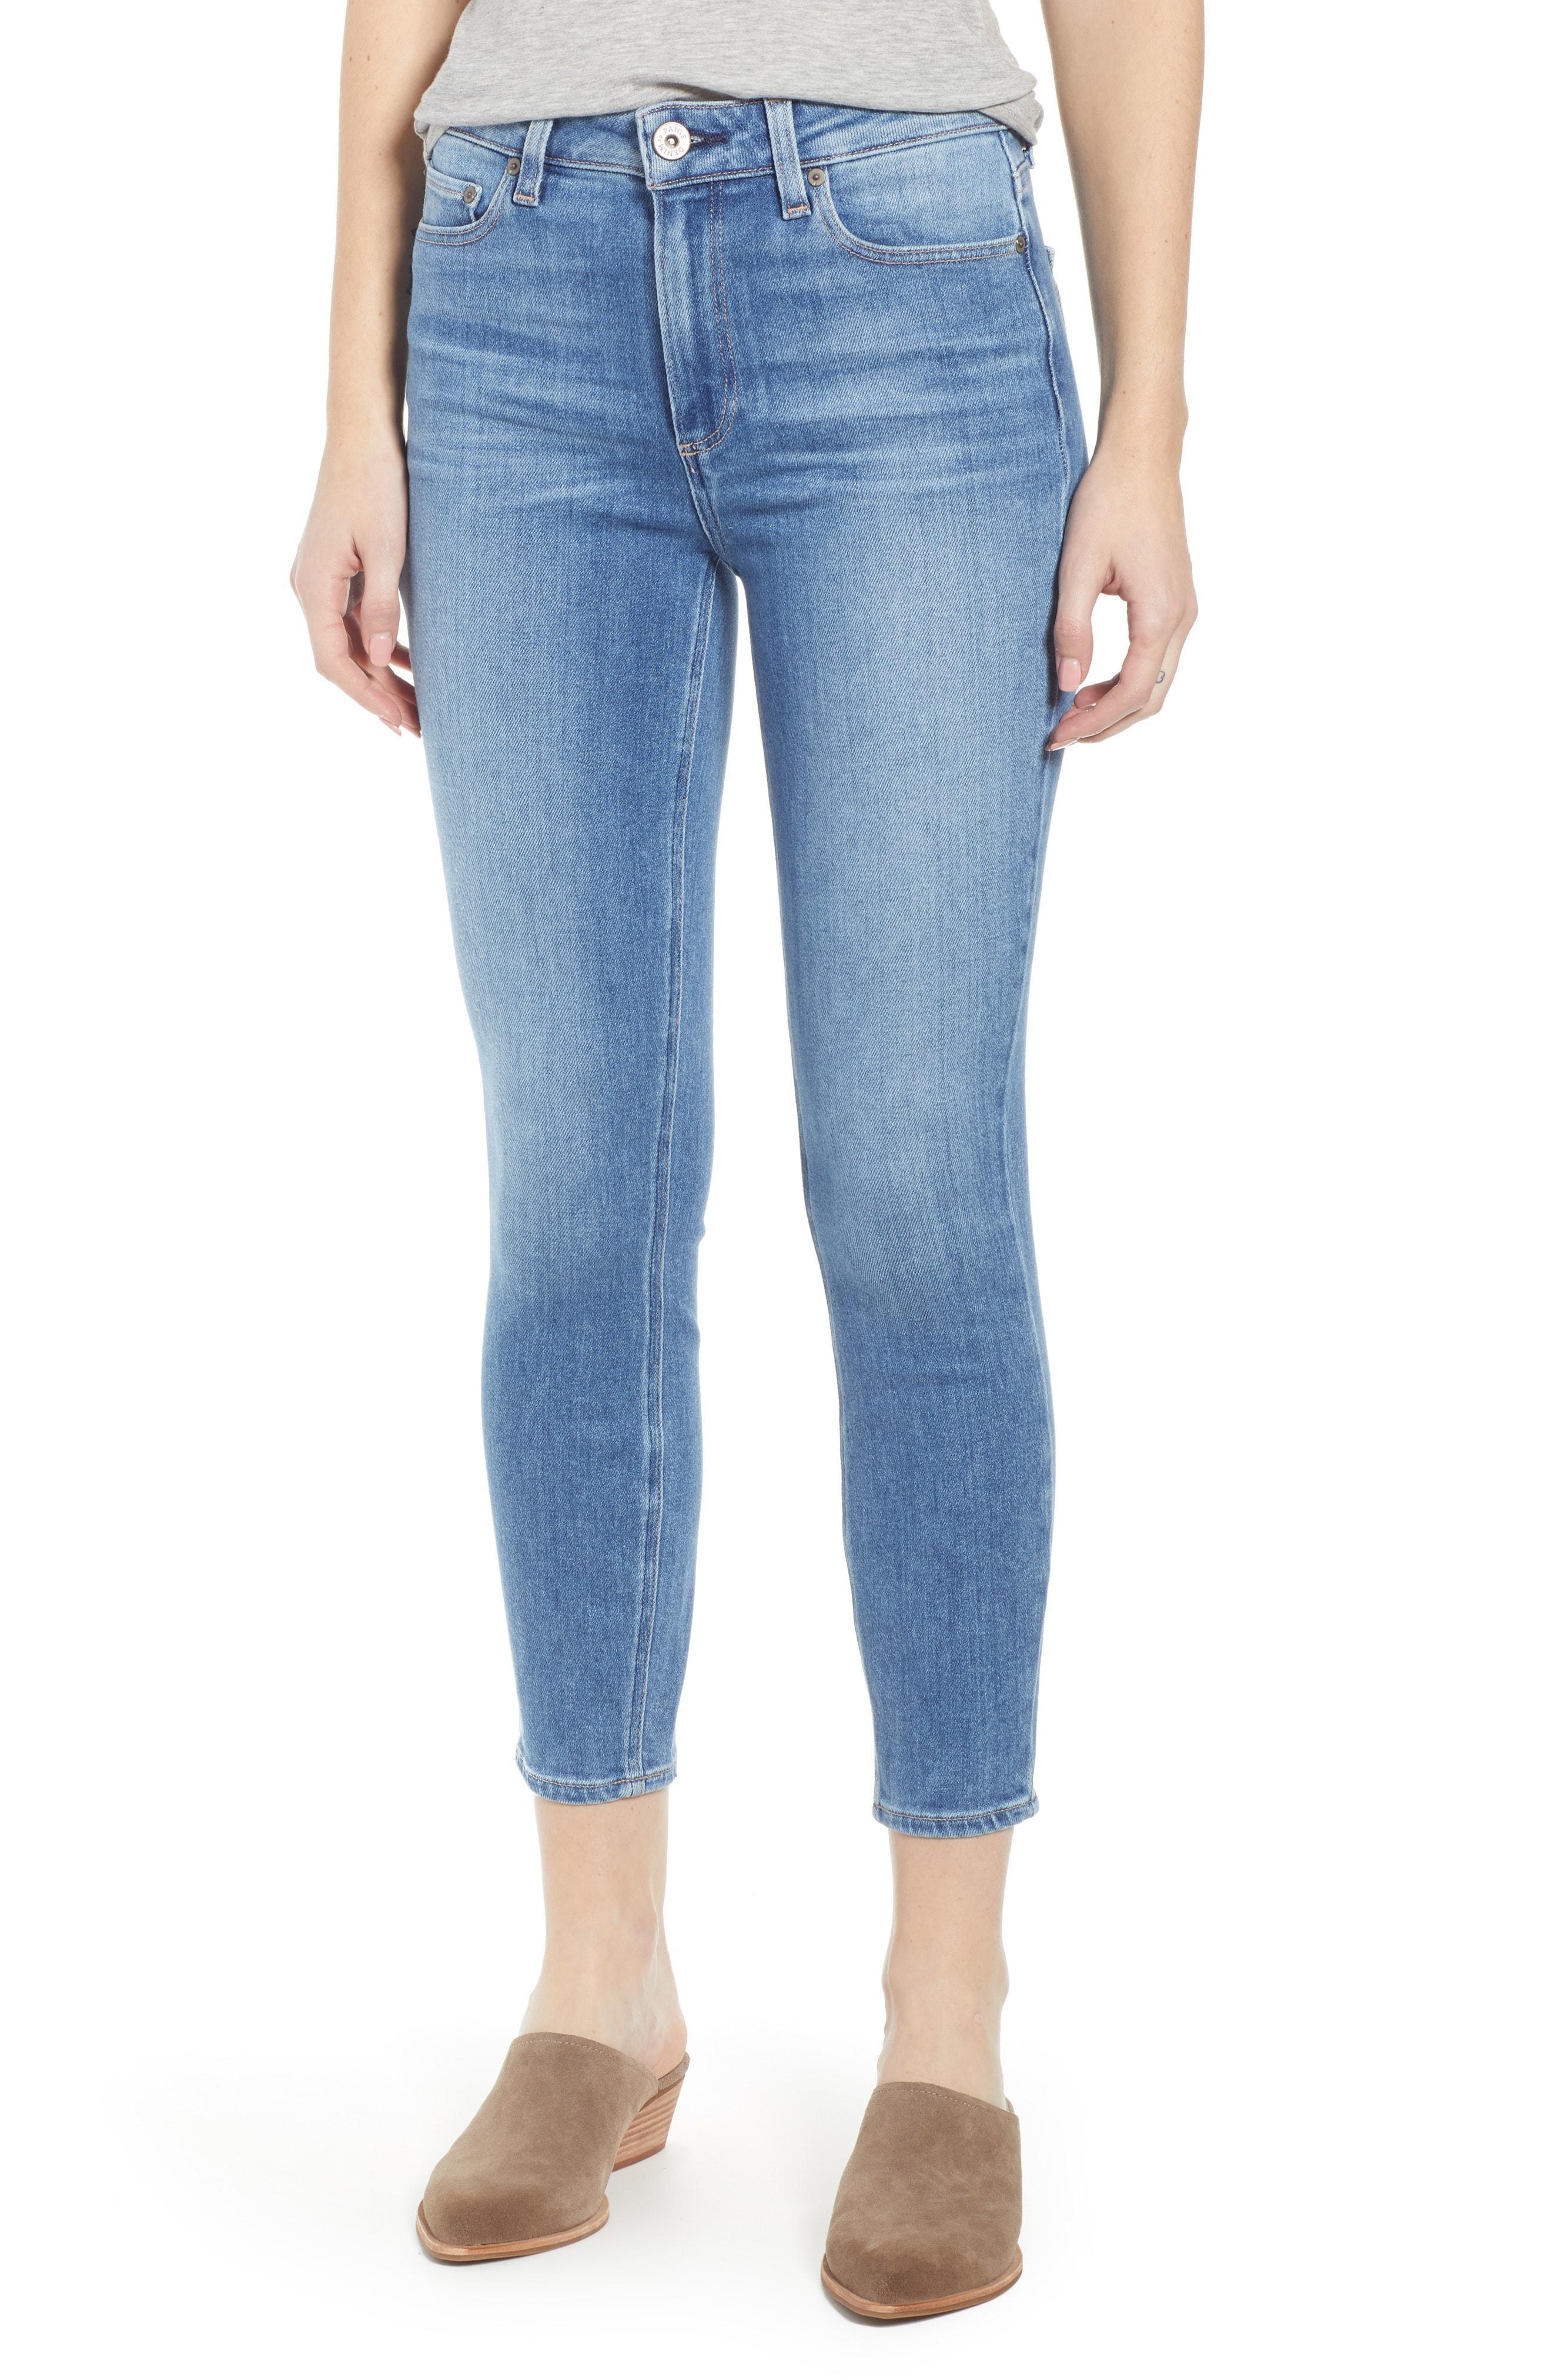 5eec231471dd8 PAIGE. Women s Blue Transcend Vintage - Hoxton High Waist Crop Skinny Jeans